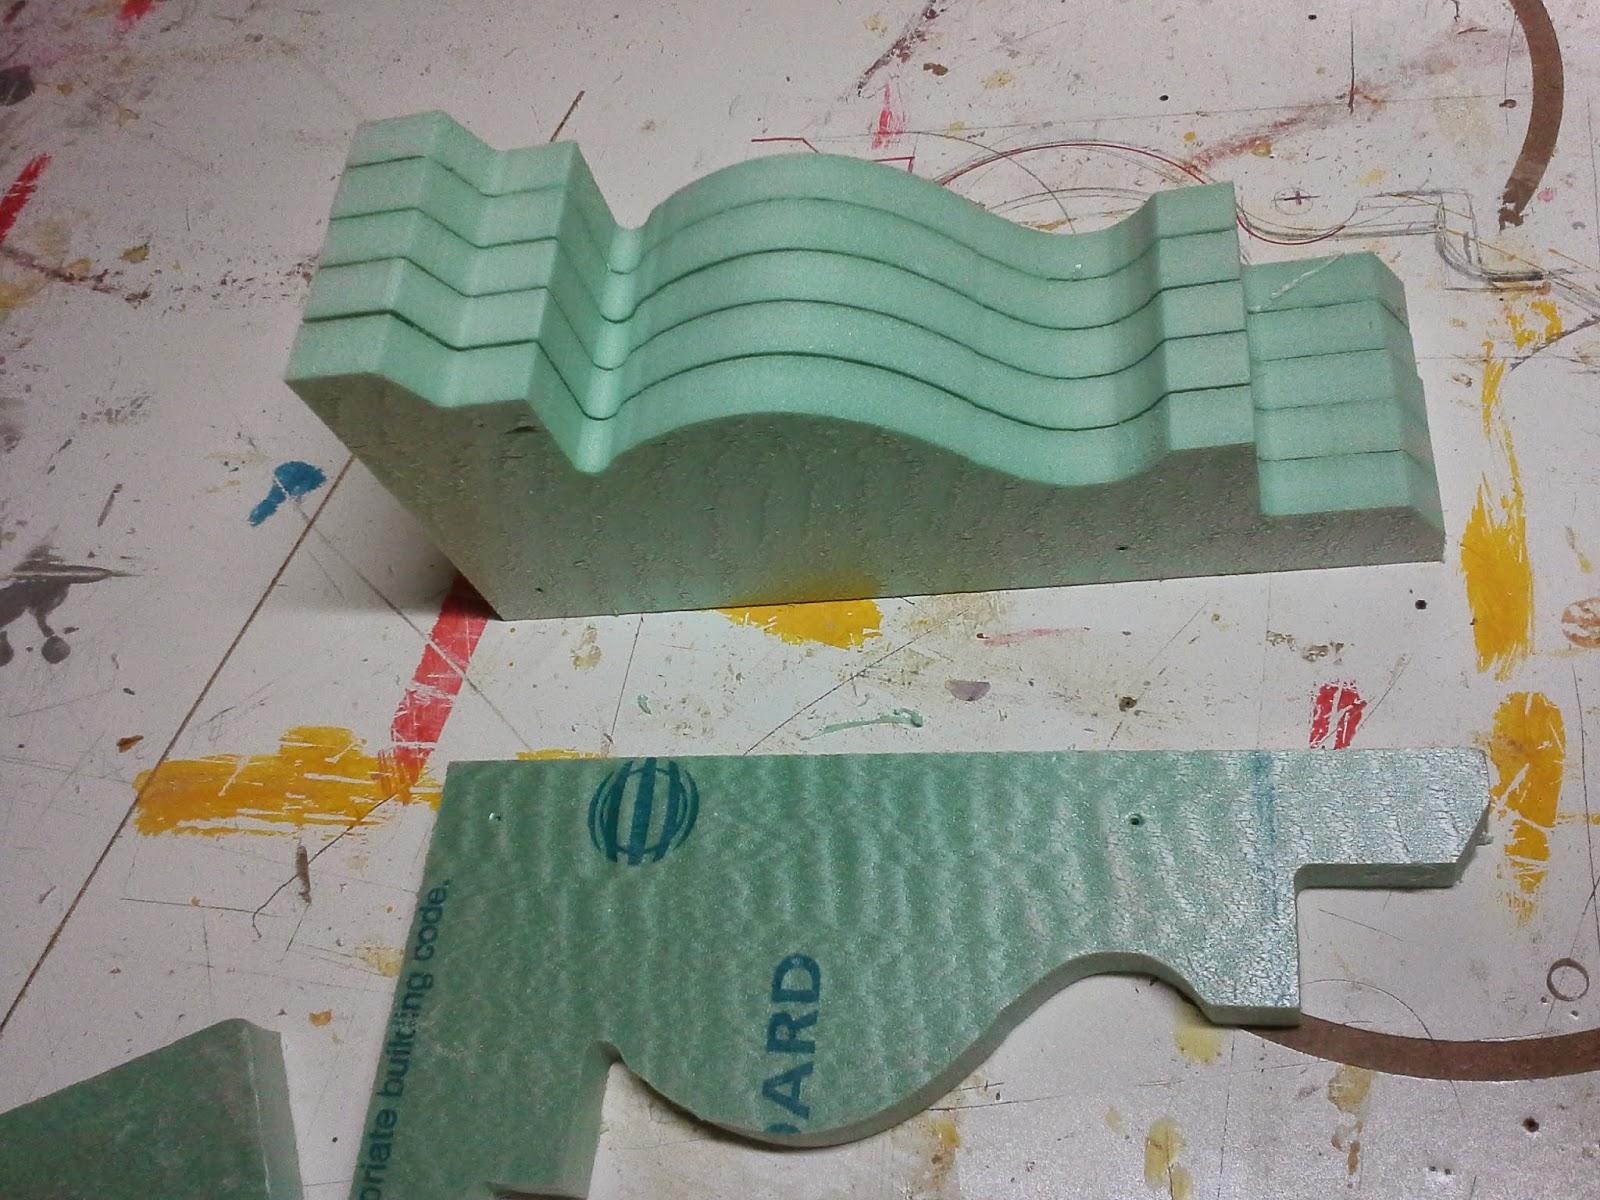 New York City Destroyed !! - foam board model making | The art of